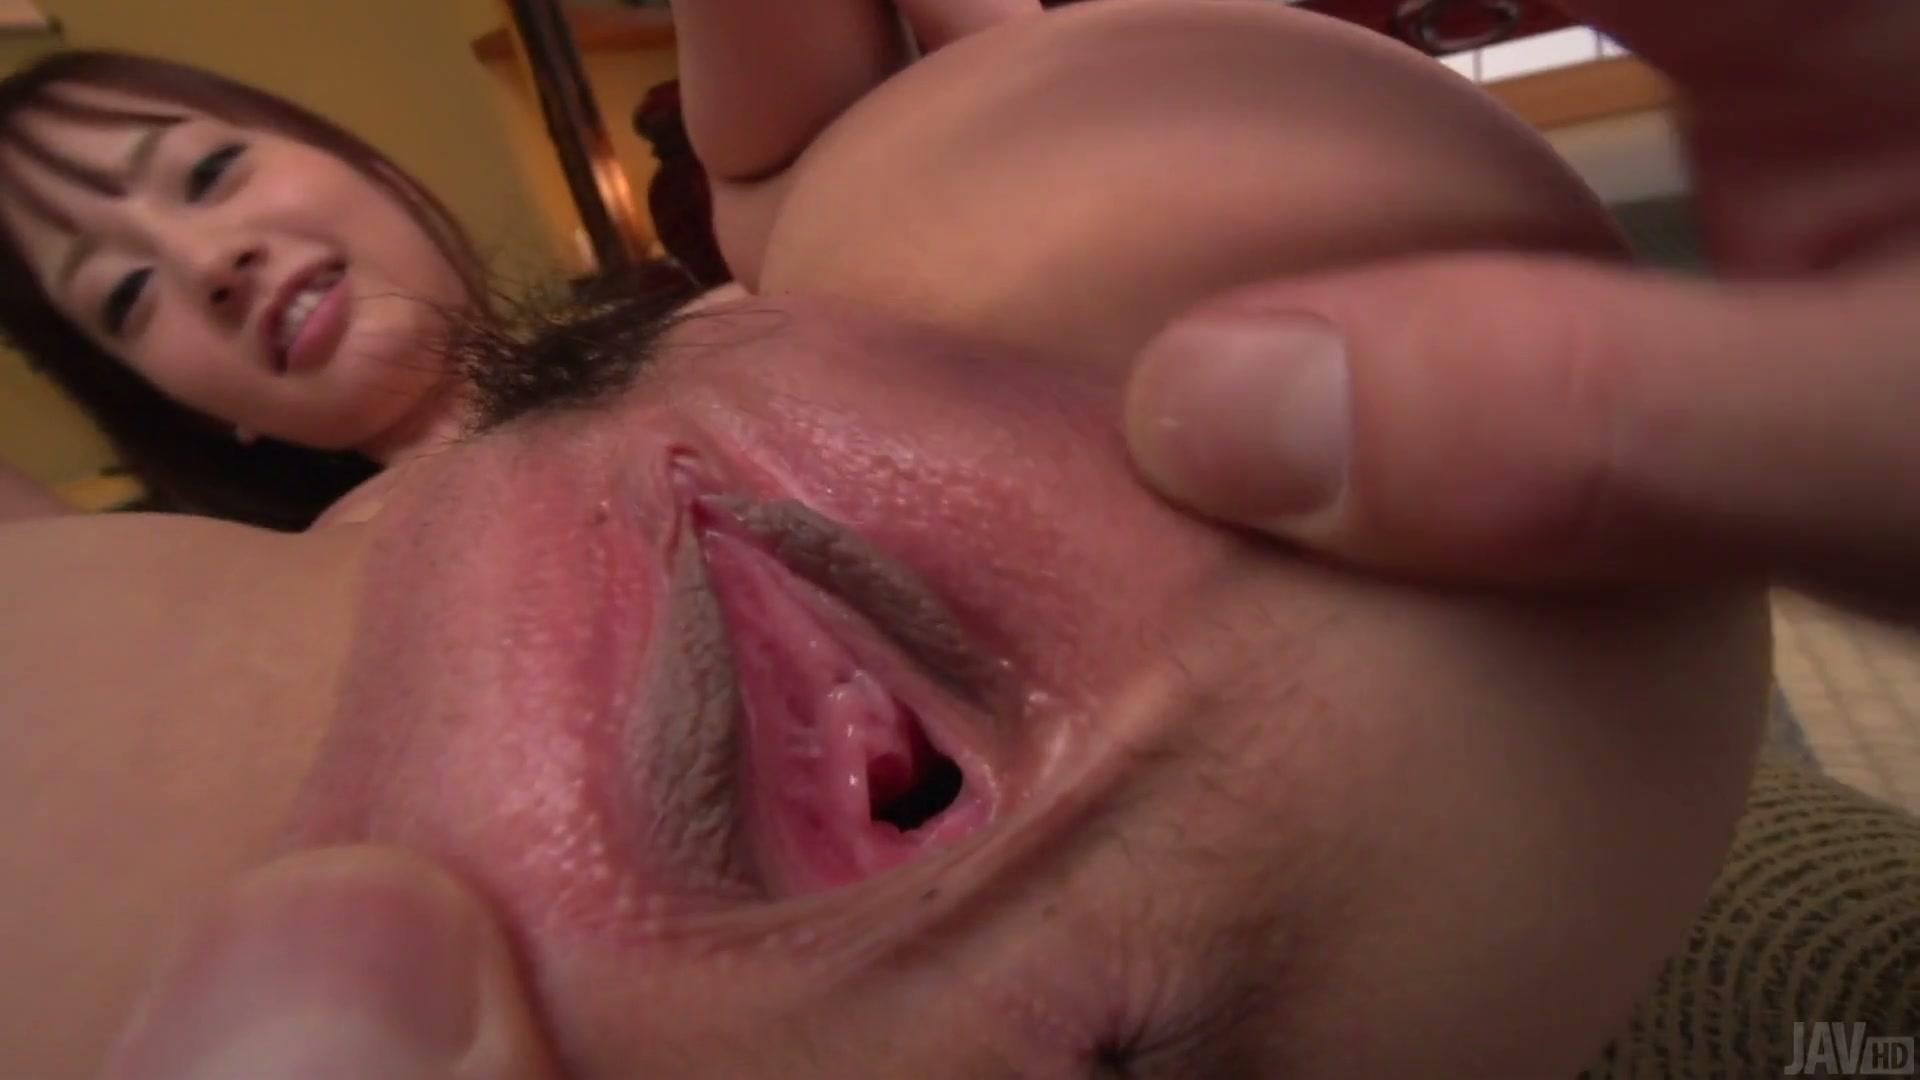 porn naturist Hawaii Milf families